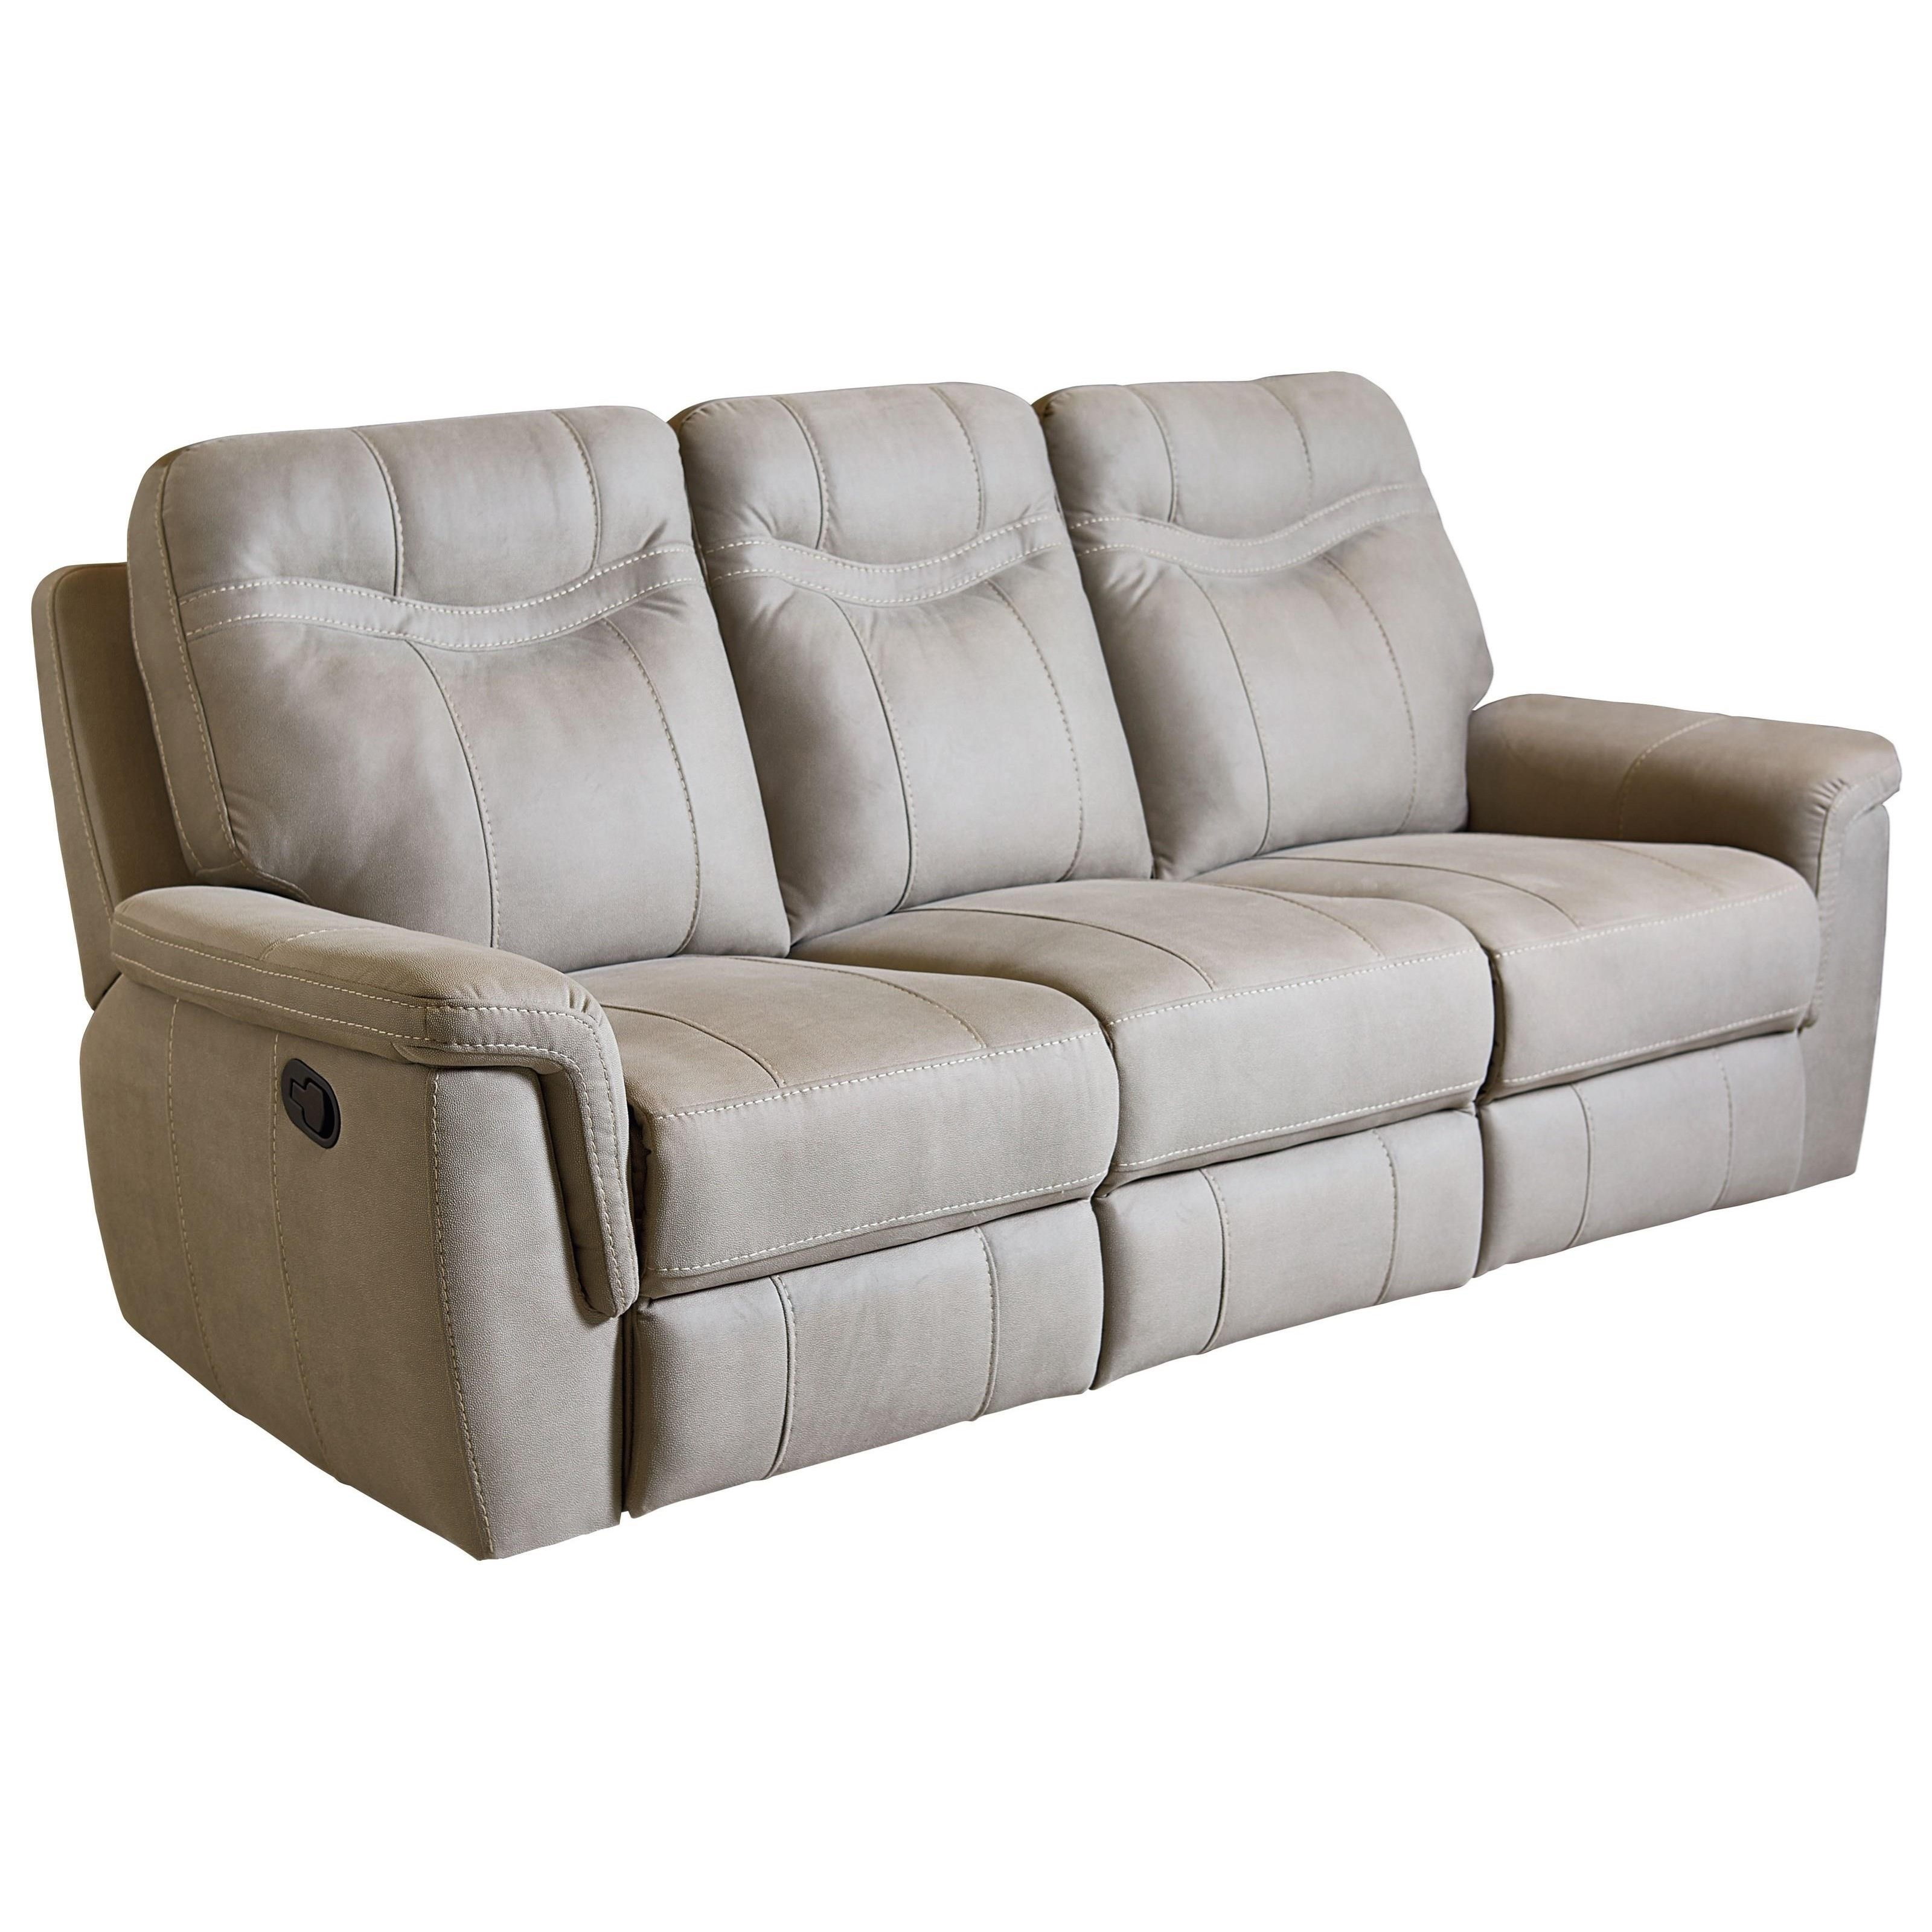 Standard furniture boardwalk 4017391 contemporary stone colored reclining sofa dunk bright - Sofa reclinable ...